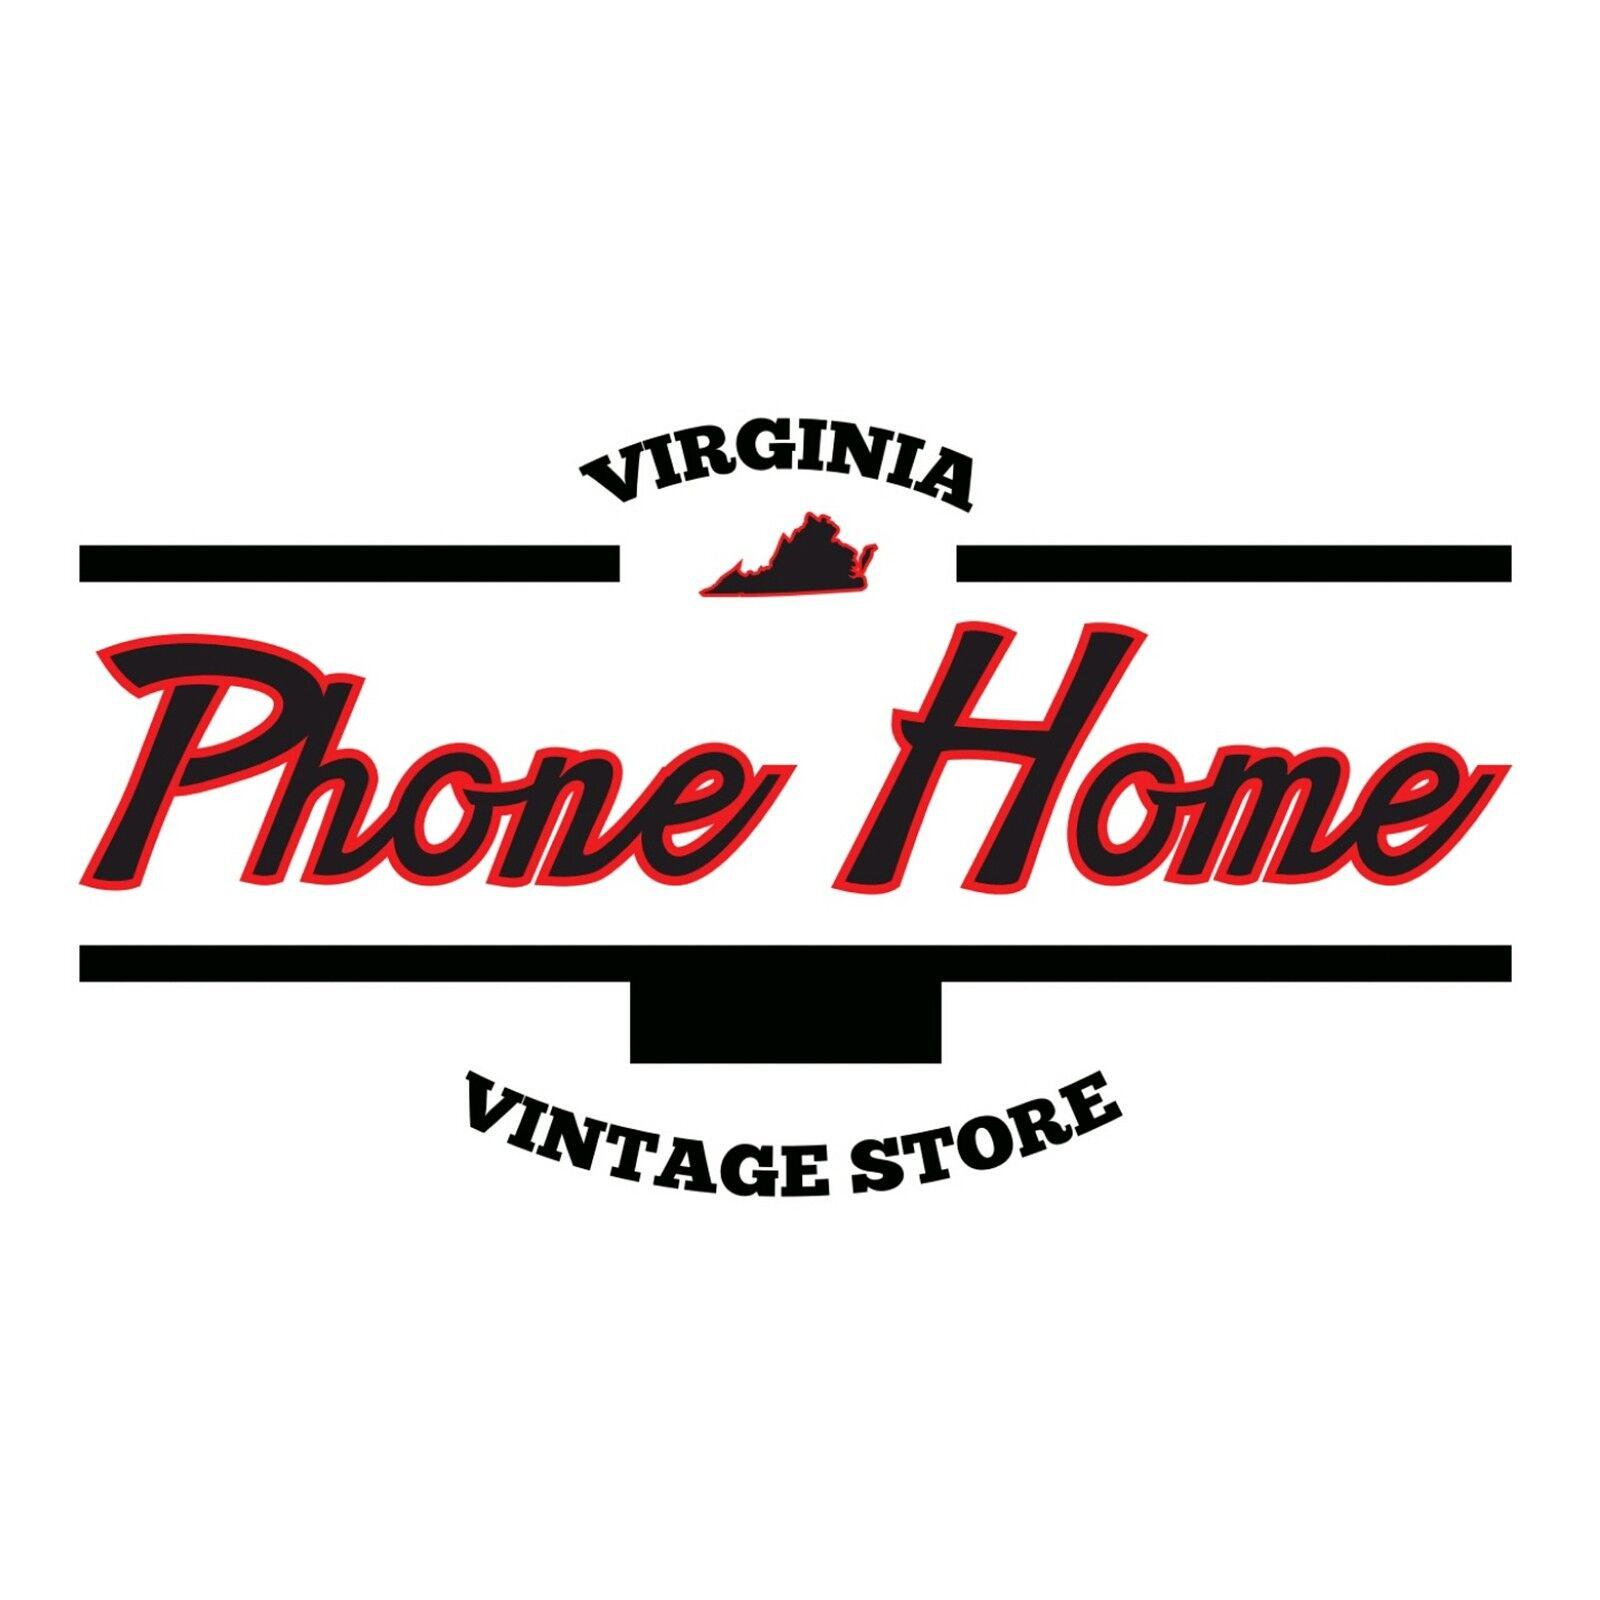 Phone Home Vintage Store